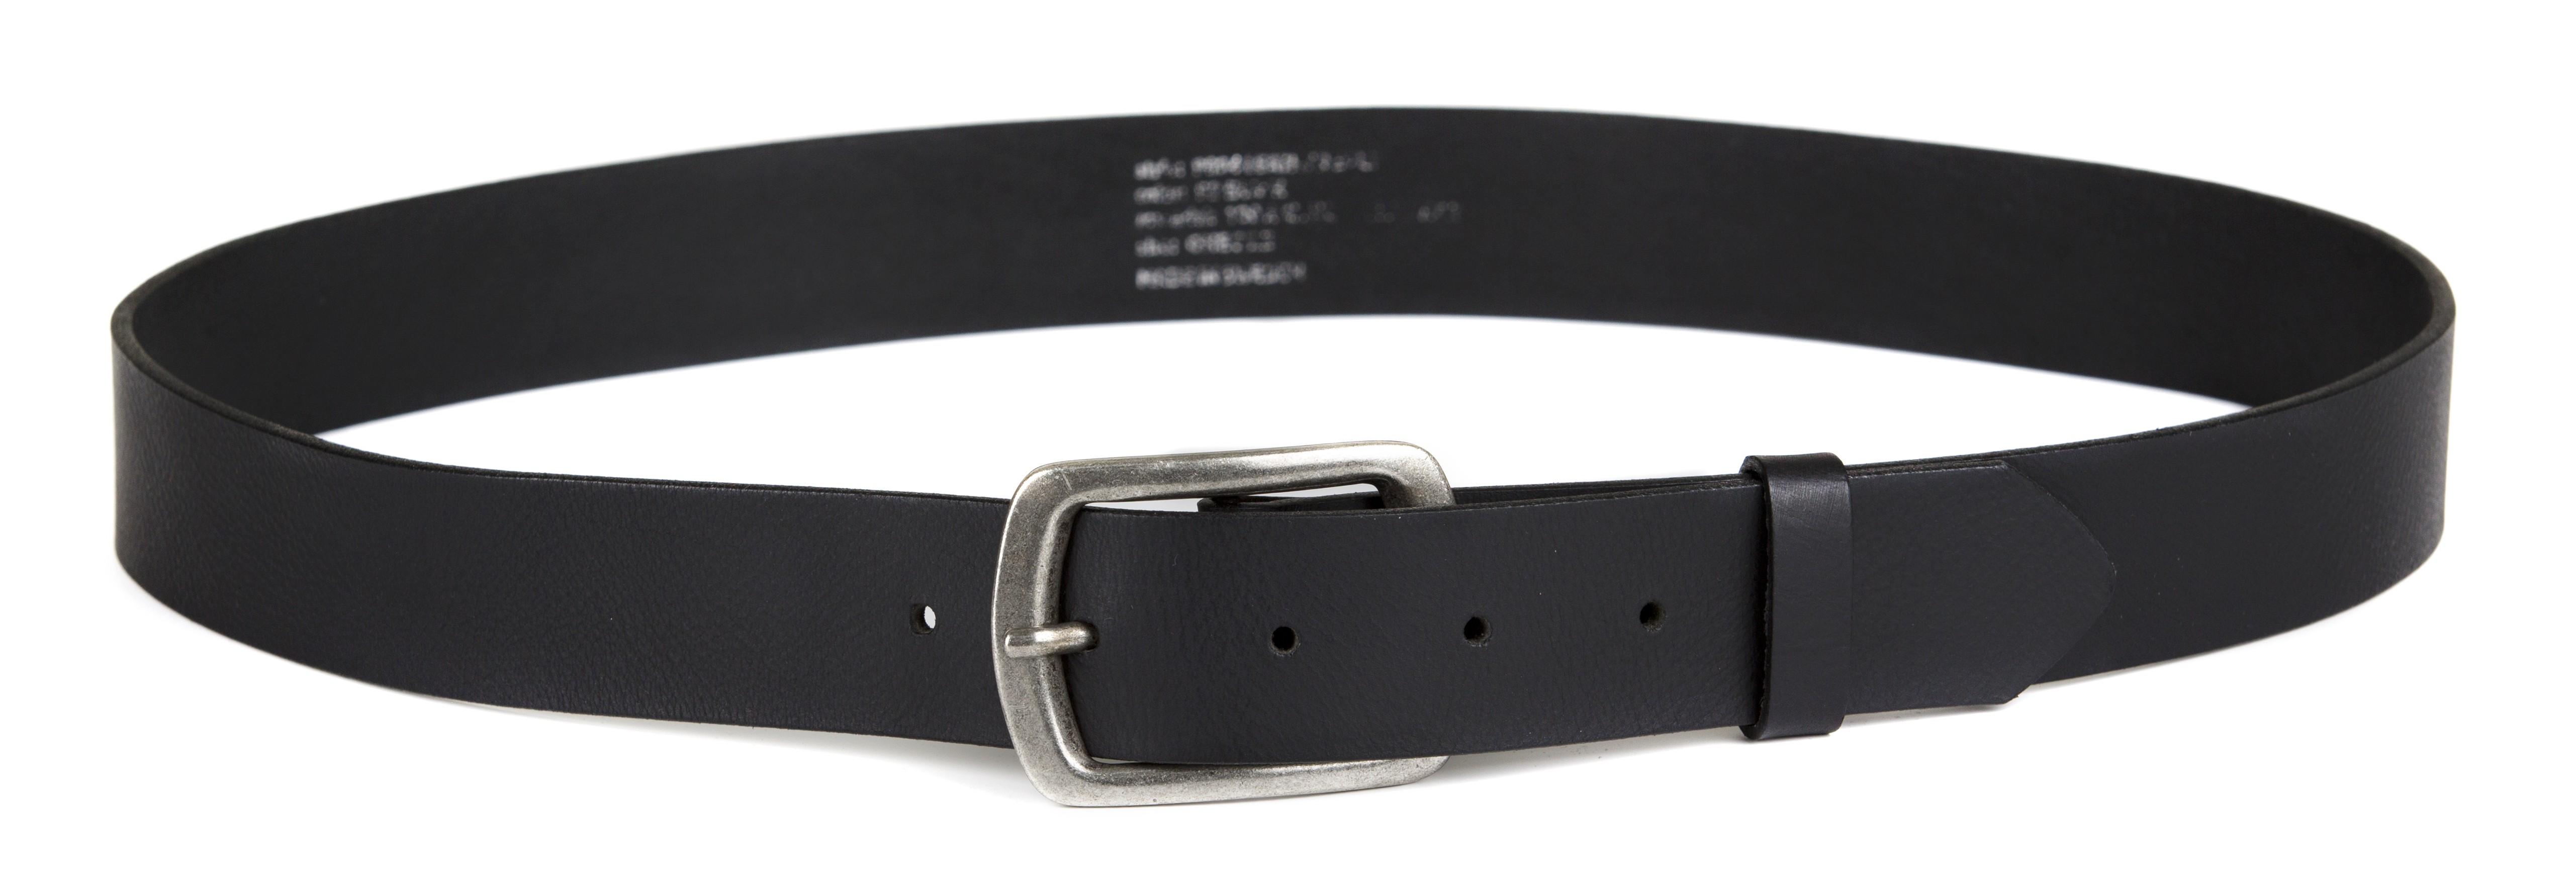 9004  Leather belt